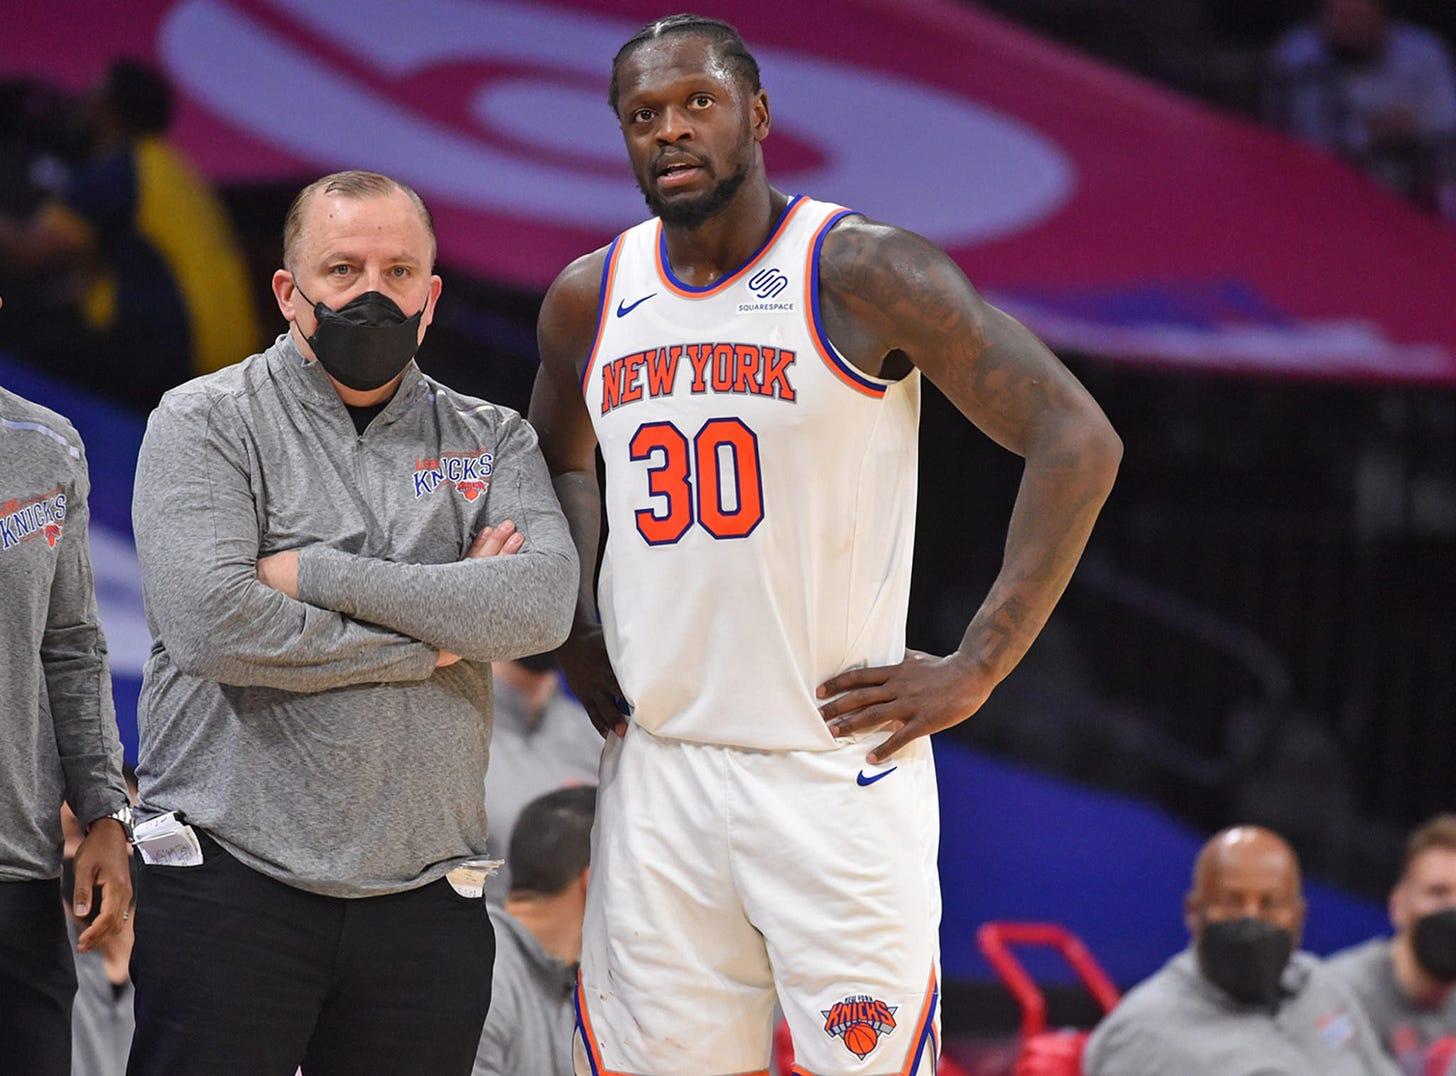 Julius Randle owes Knicks new regime: 'They saved me'